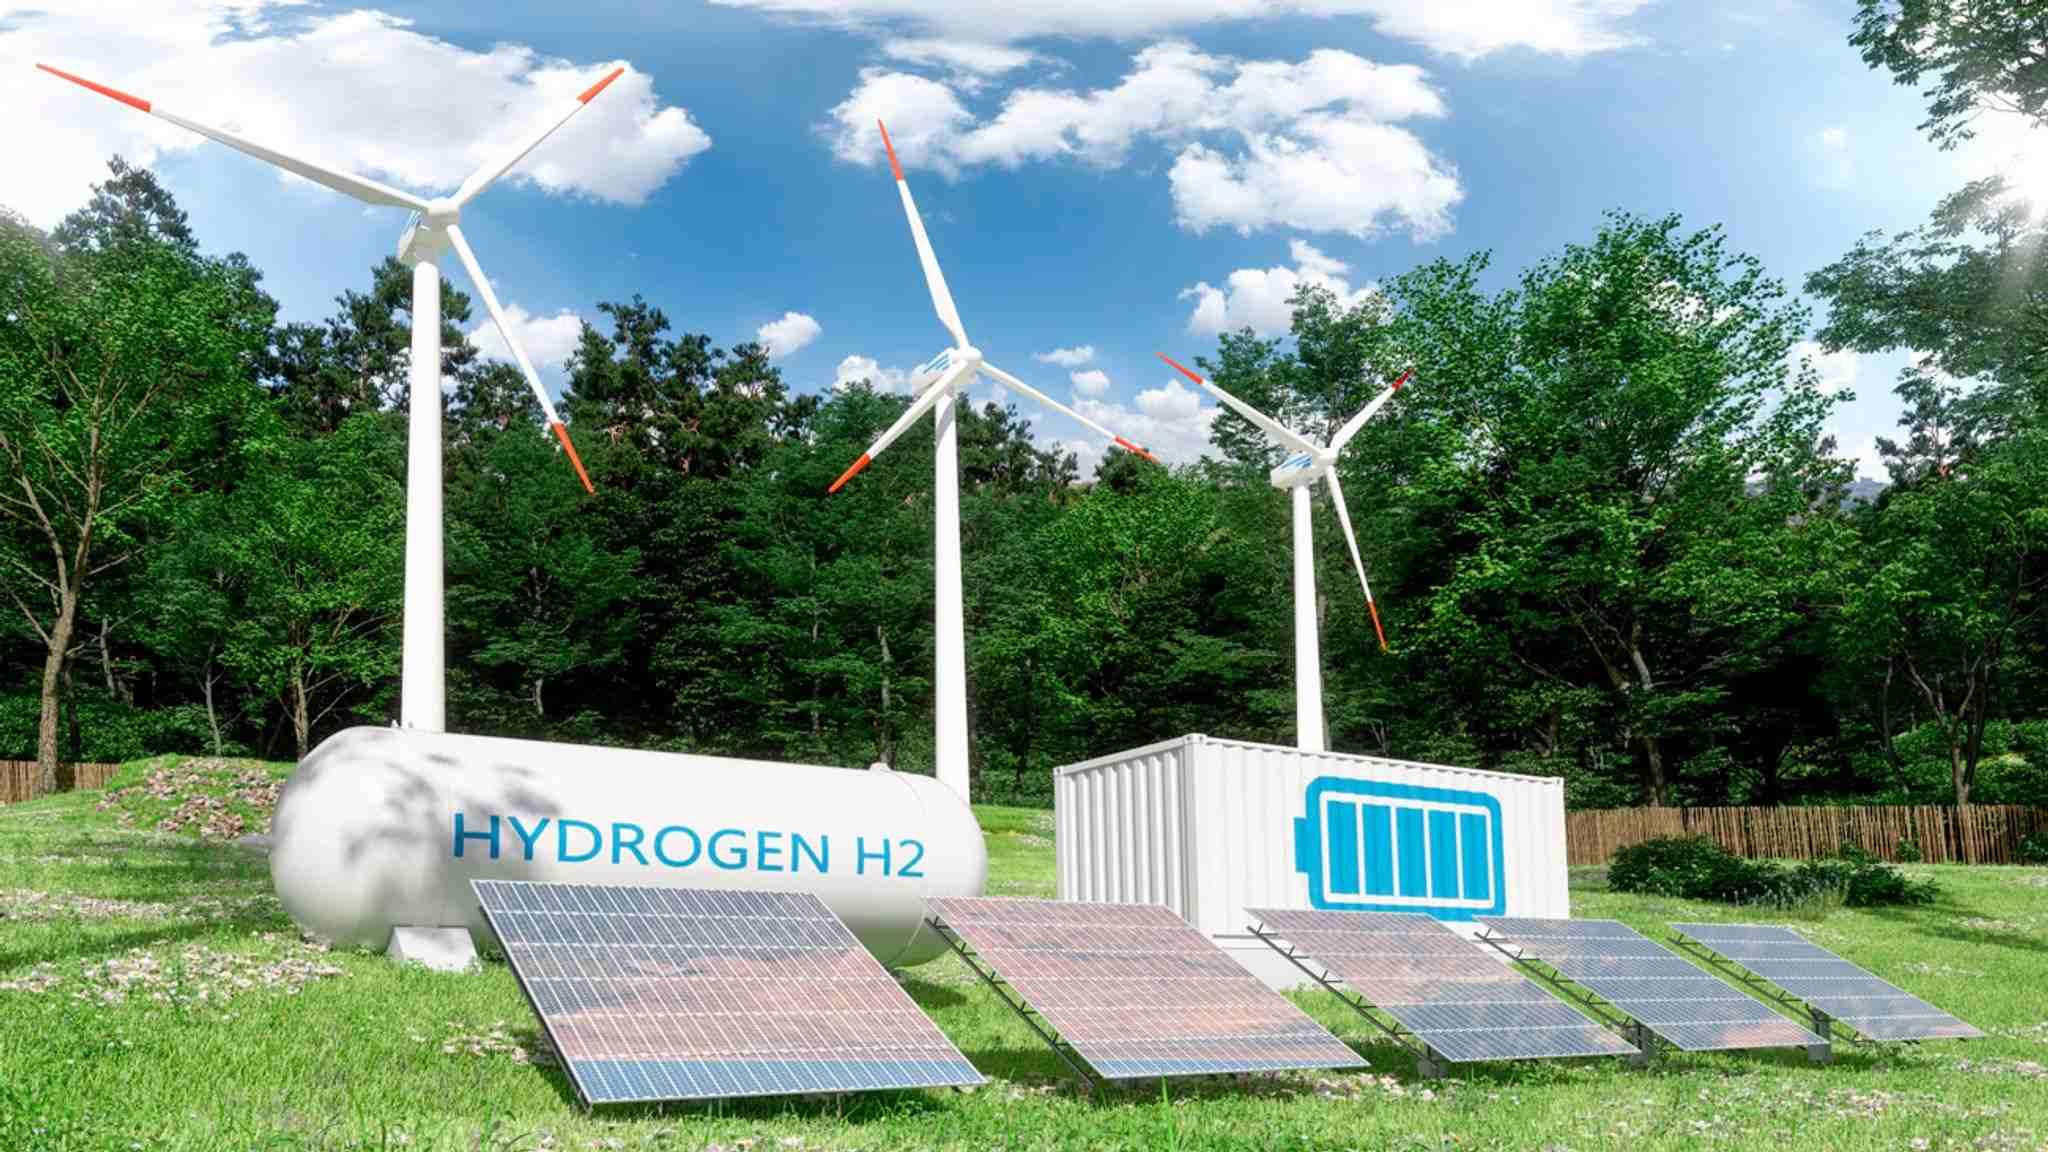 hydrogen-power-equipment-leasing-financing-fairfield-capital